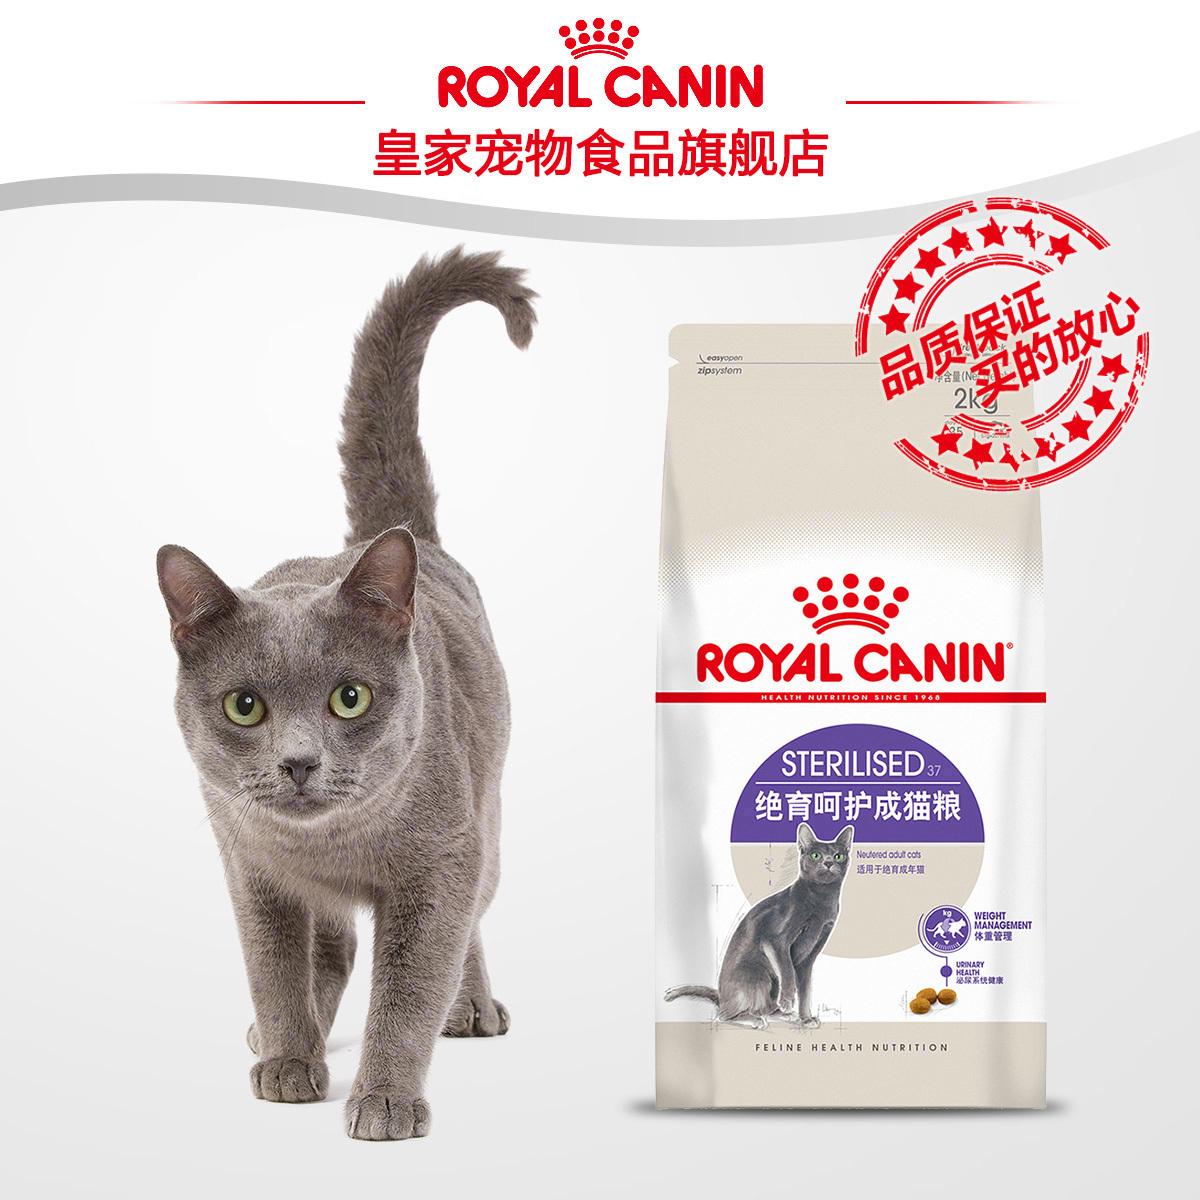 Royal Canin皇家猫粮 绝育呵护成猫粮SA37-2KG 猫主粮